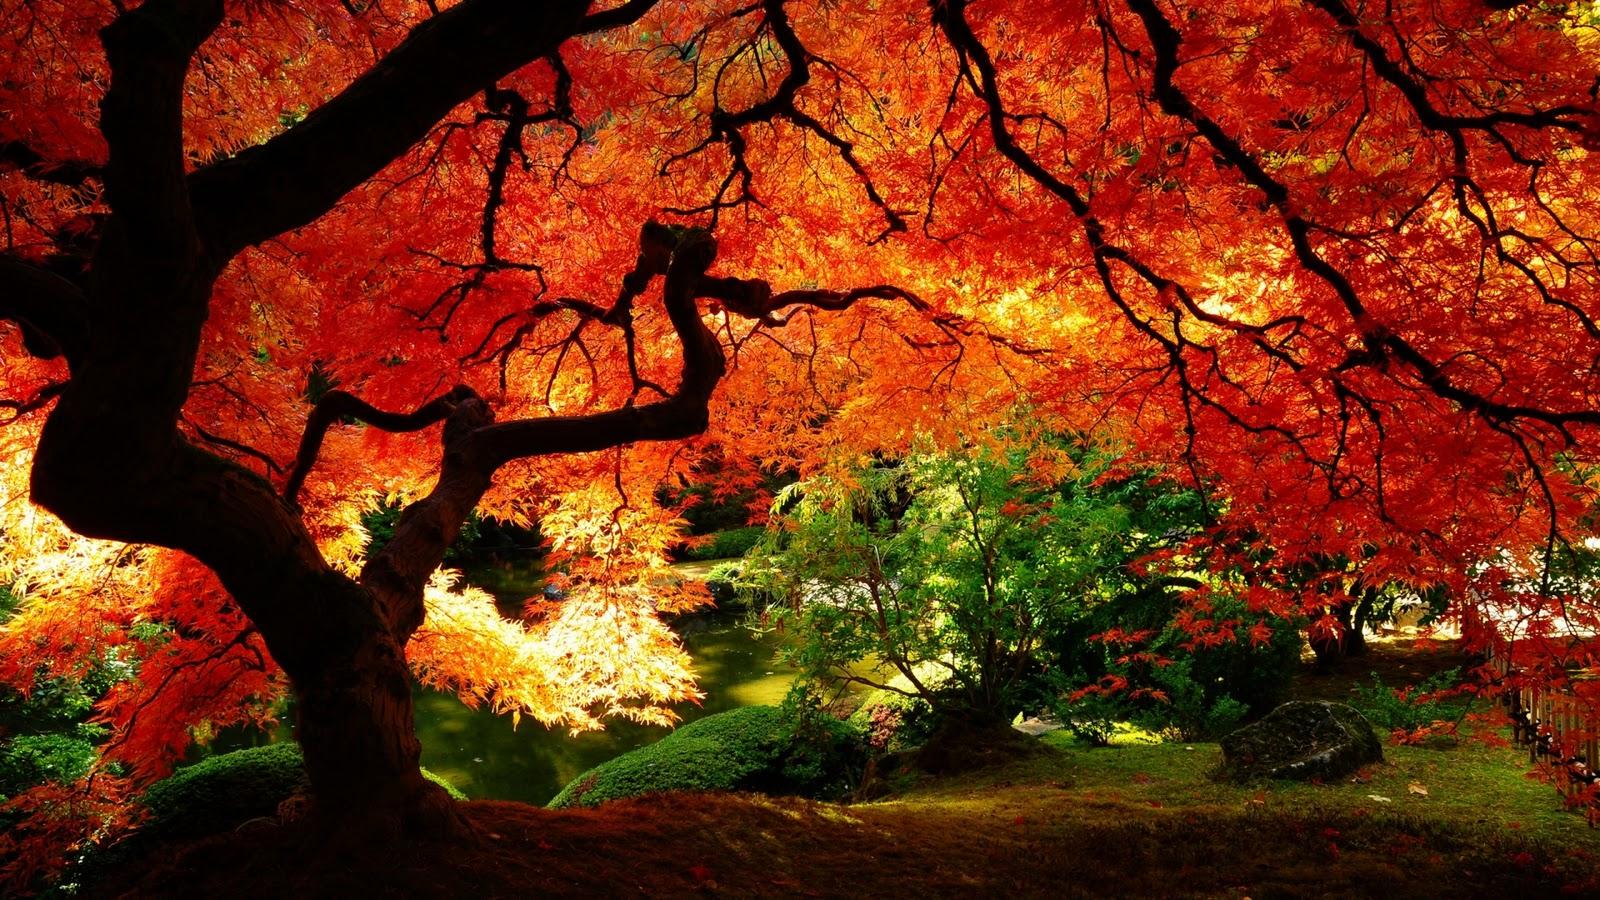 http://1.bp.blogspot.com/-cvrHr1-_Yz4/TraPzN_6LqI/AAAAAAAAEdg/CtuiyHIiKDk/s1600/maple-in-autumn-wallpapers_25571_1920x1080.jpg